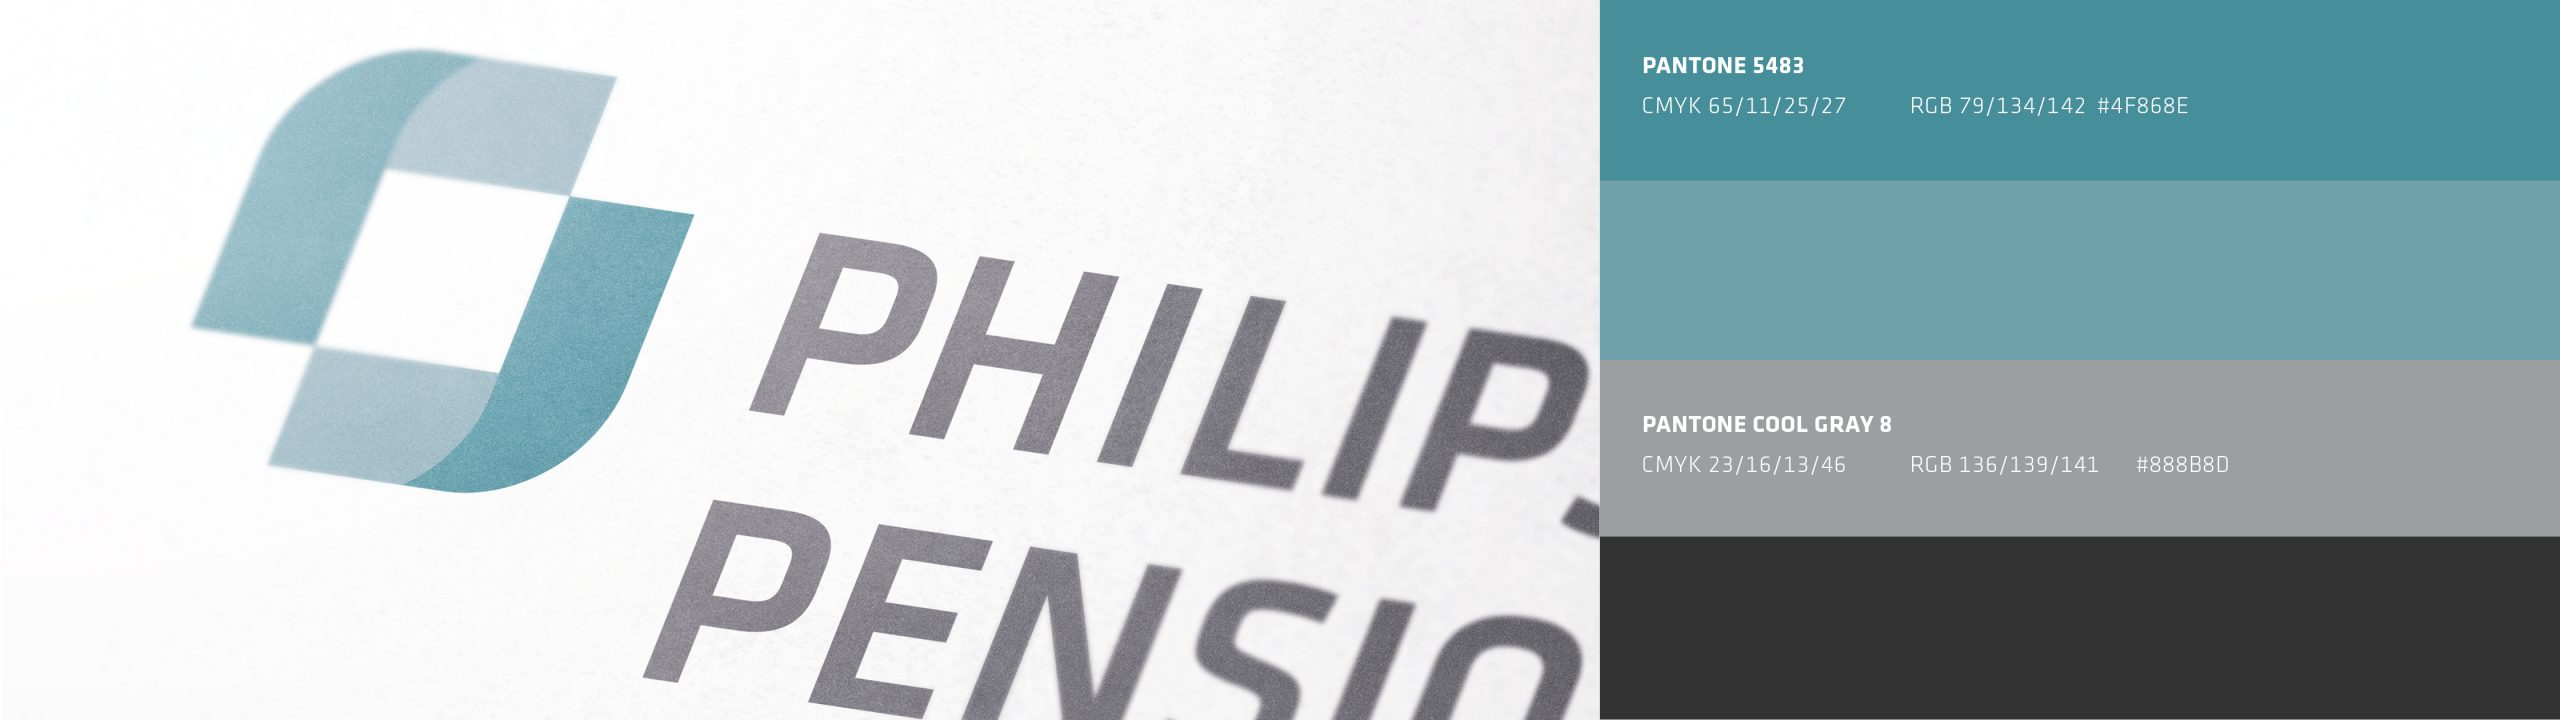 Philips Pensionskasse: CD-Entwicklung von Bosbach, Key Visual